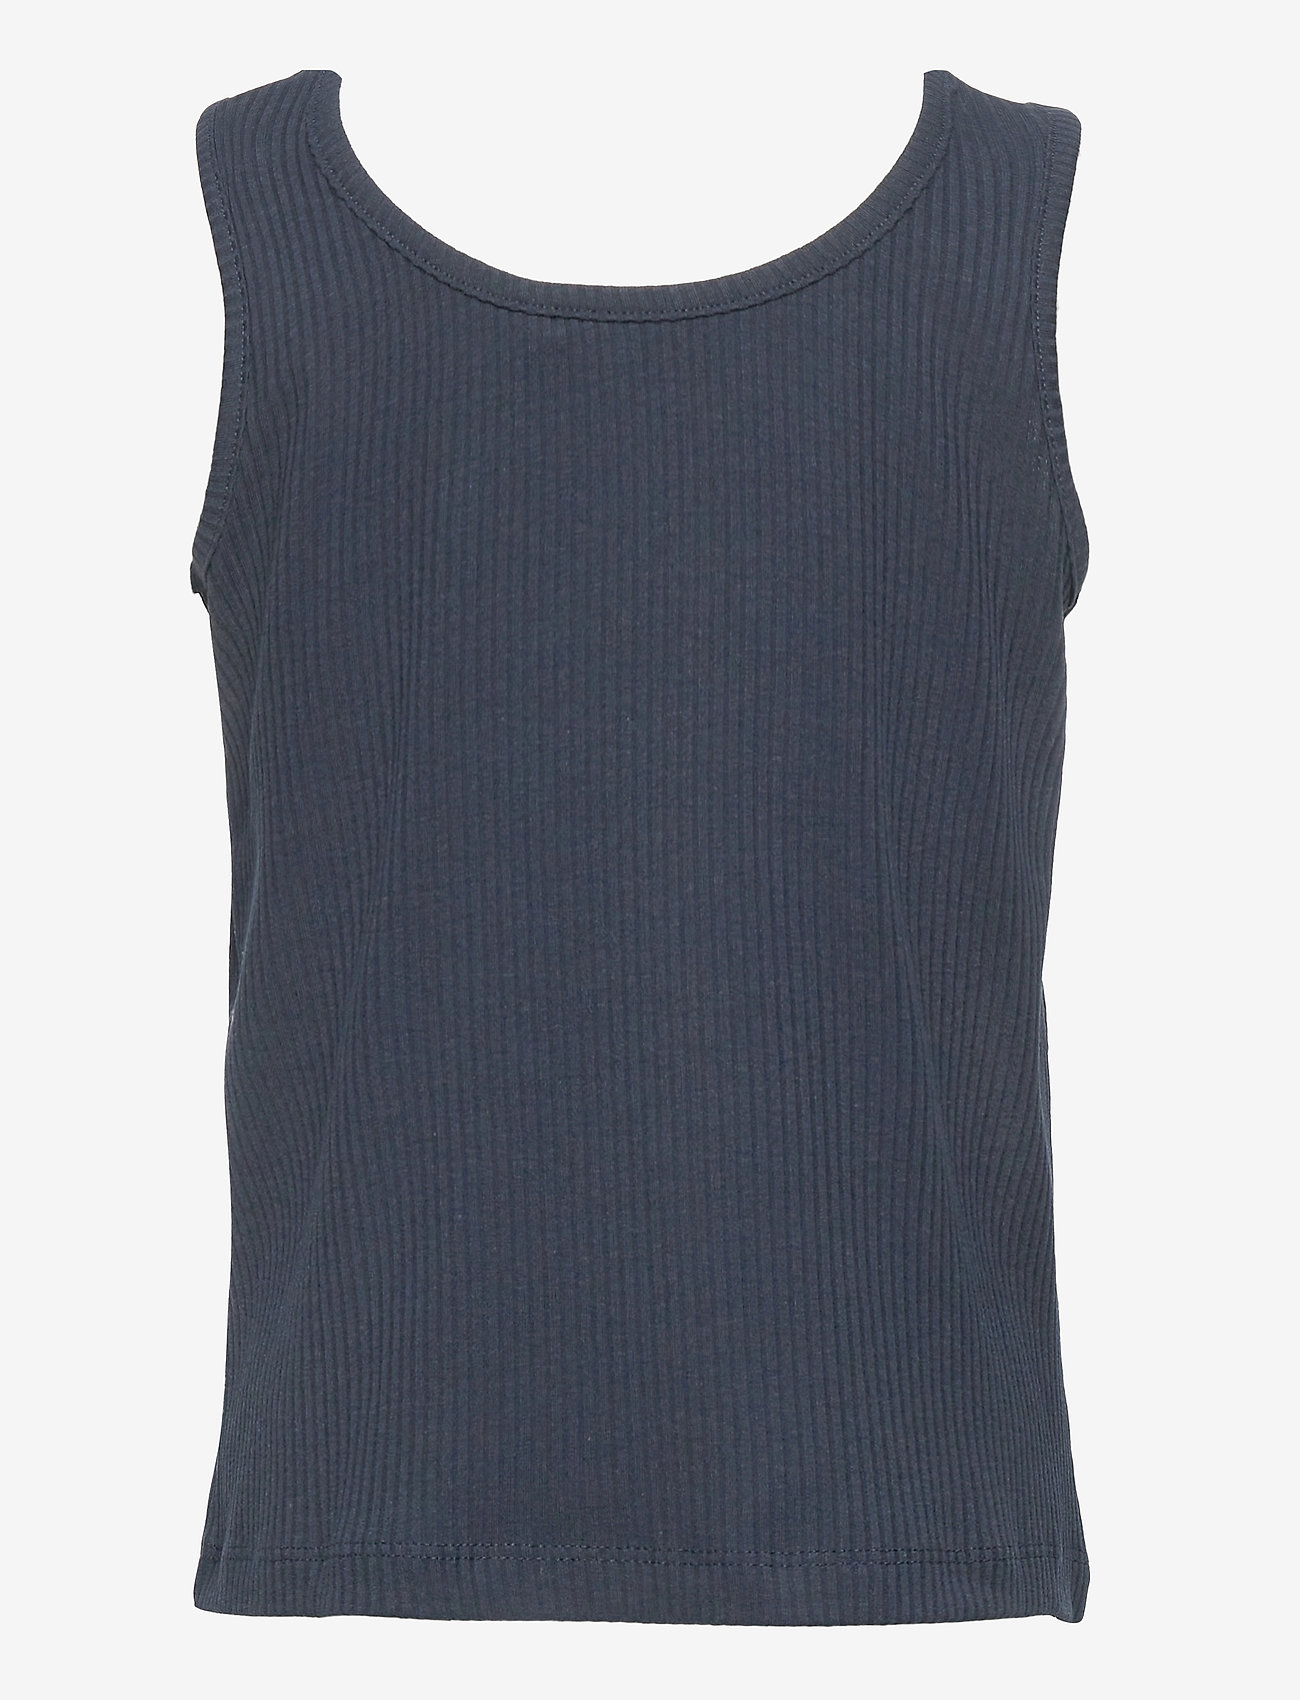 name it - NKFVAJA SHORT TANK TOP HH - t-shirts - dark sapphire - 1